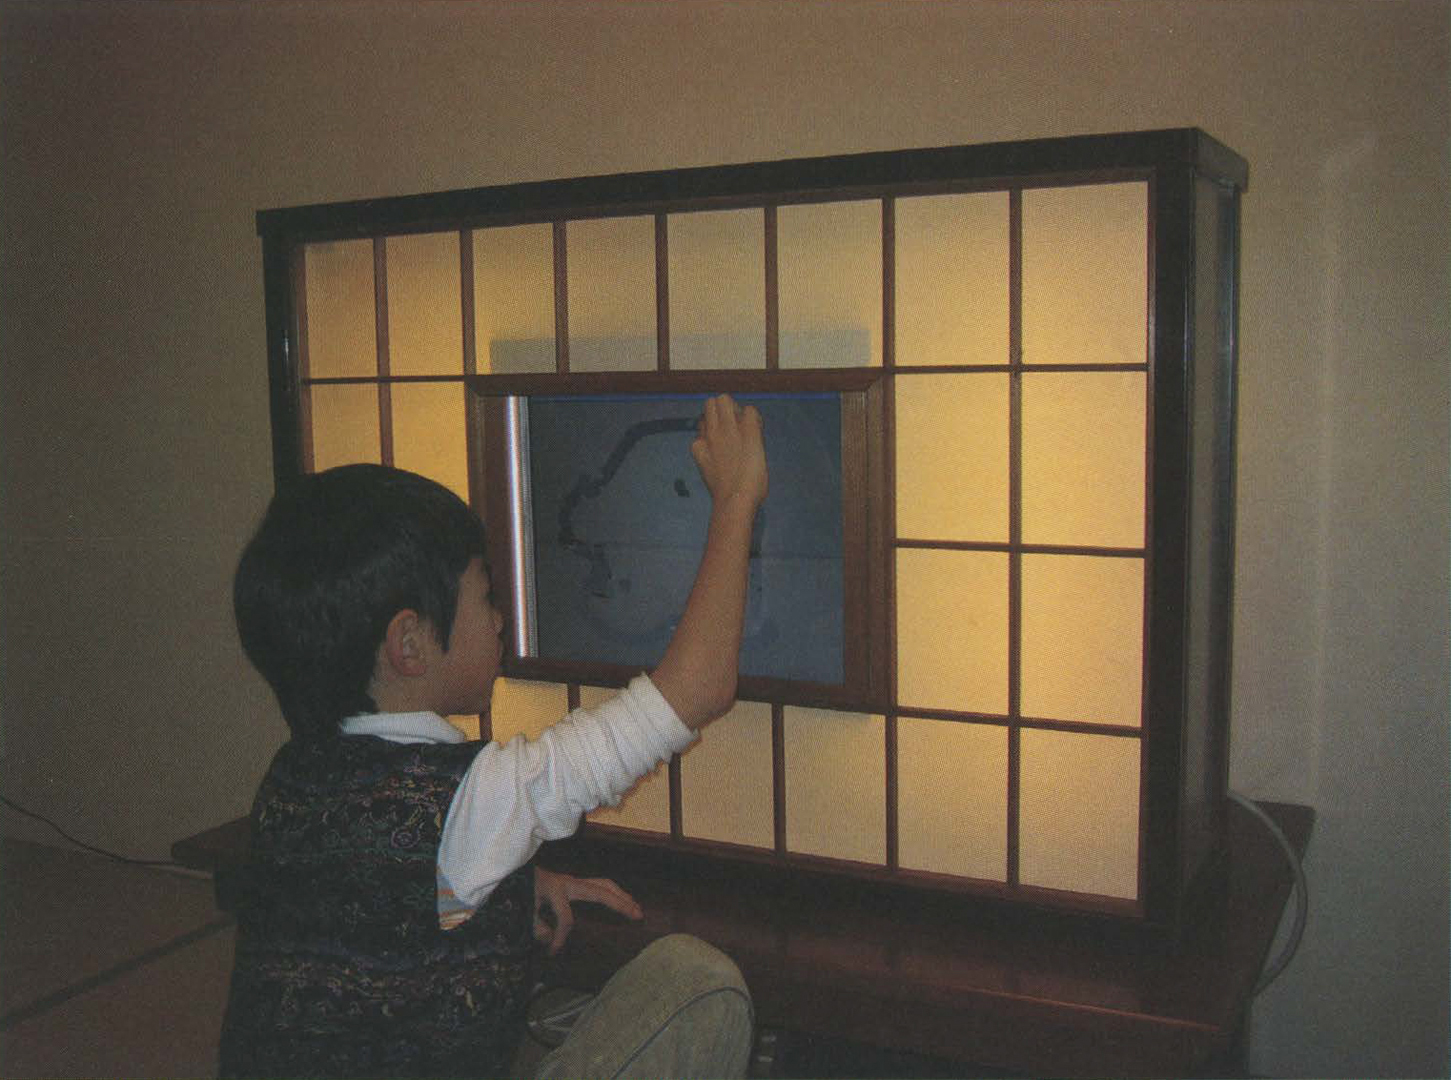 ©2007, Qinglian Guo, A Digital Window for Watching Snow Scenes